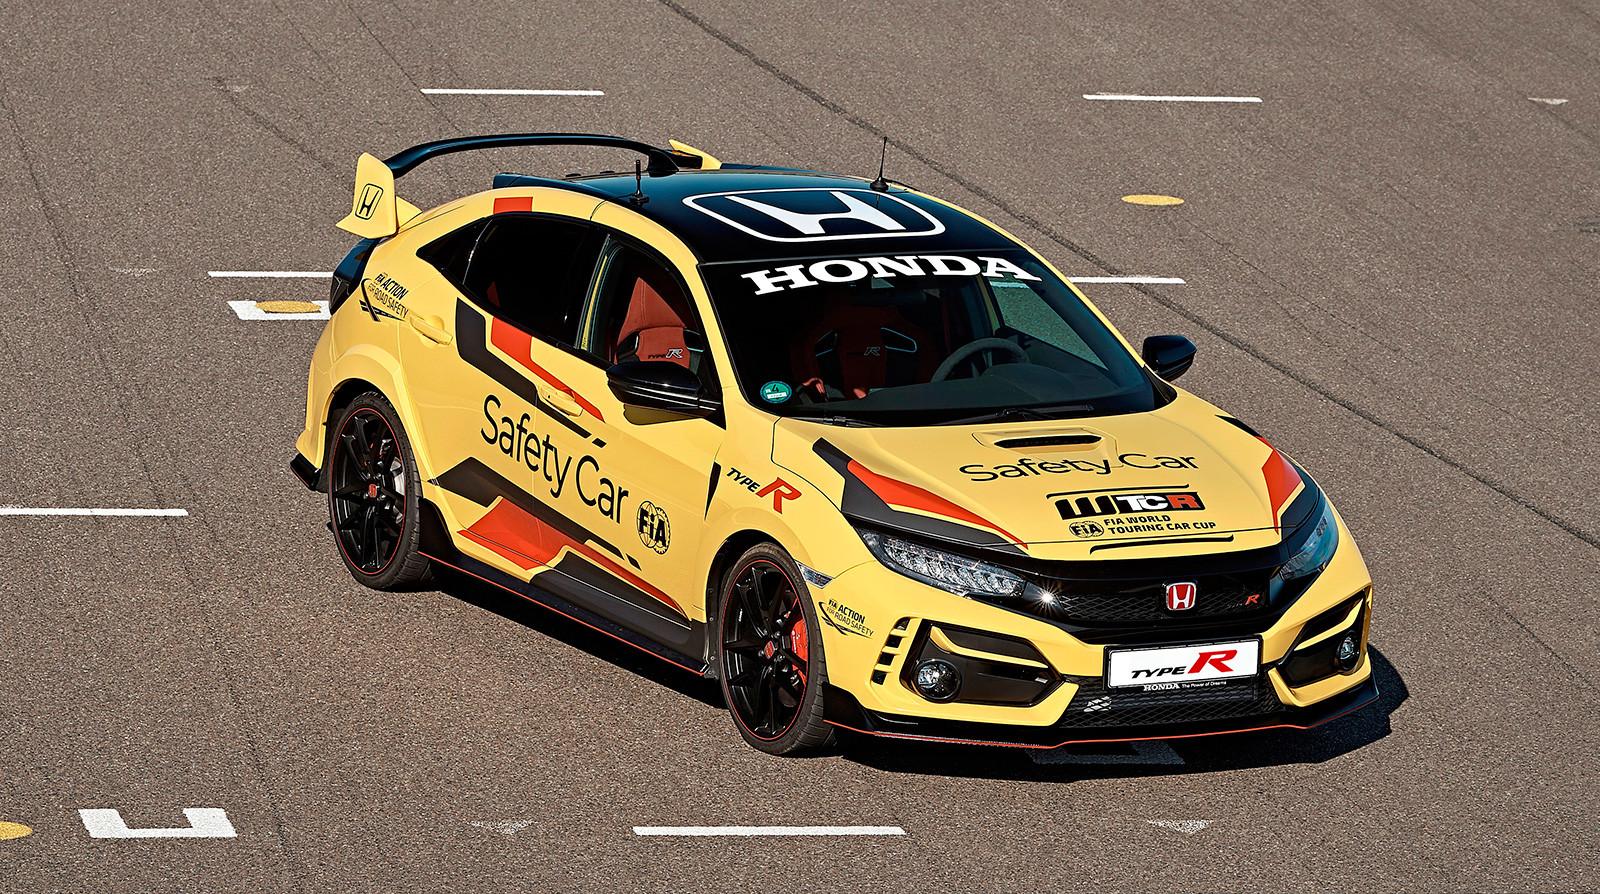 Foto de Honda Civic Type R Limited Edition Safety Car WTCR 2020 (6/9)